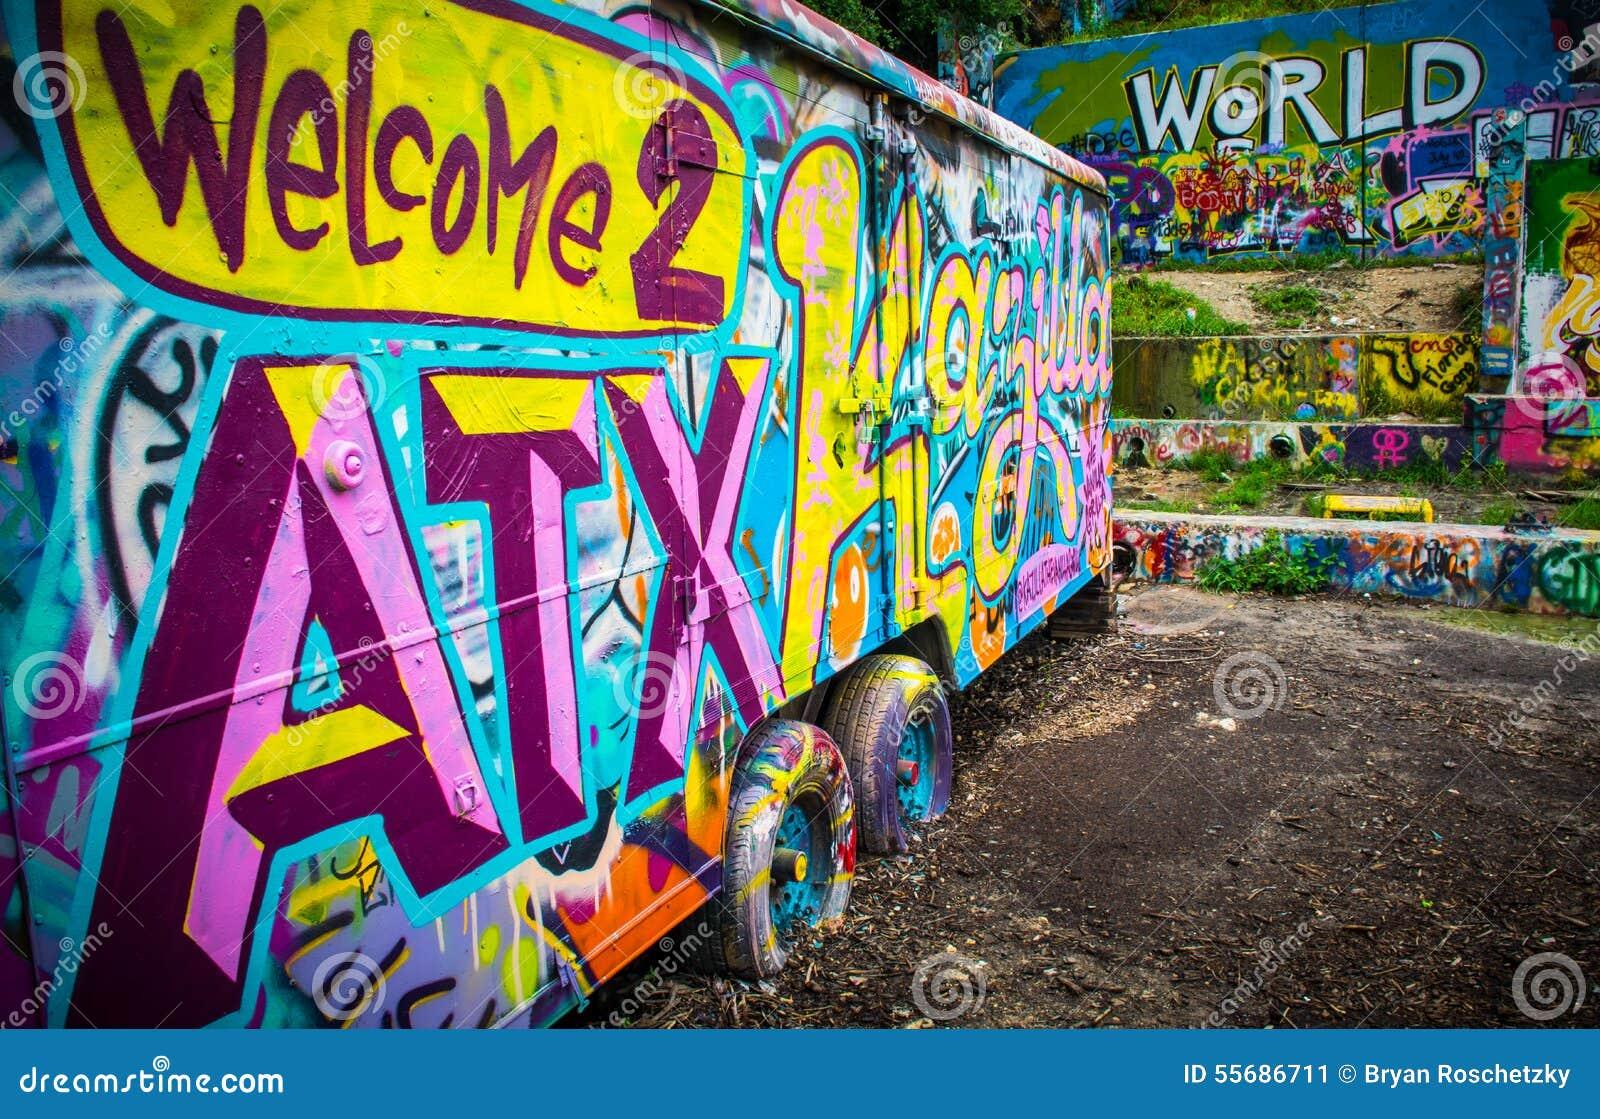 Graffiti wall usa - Welcome To Austin Texas Usa World Music Capital Stock Image